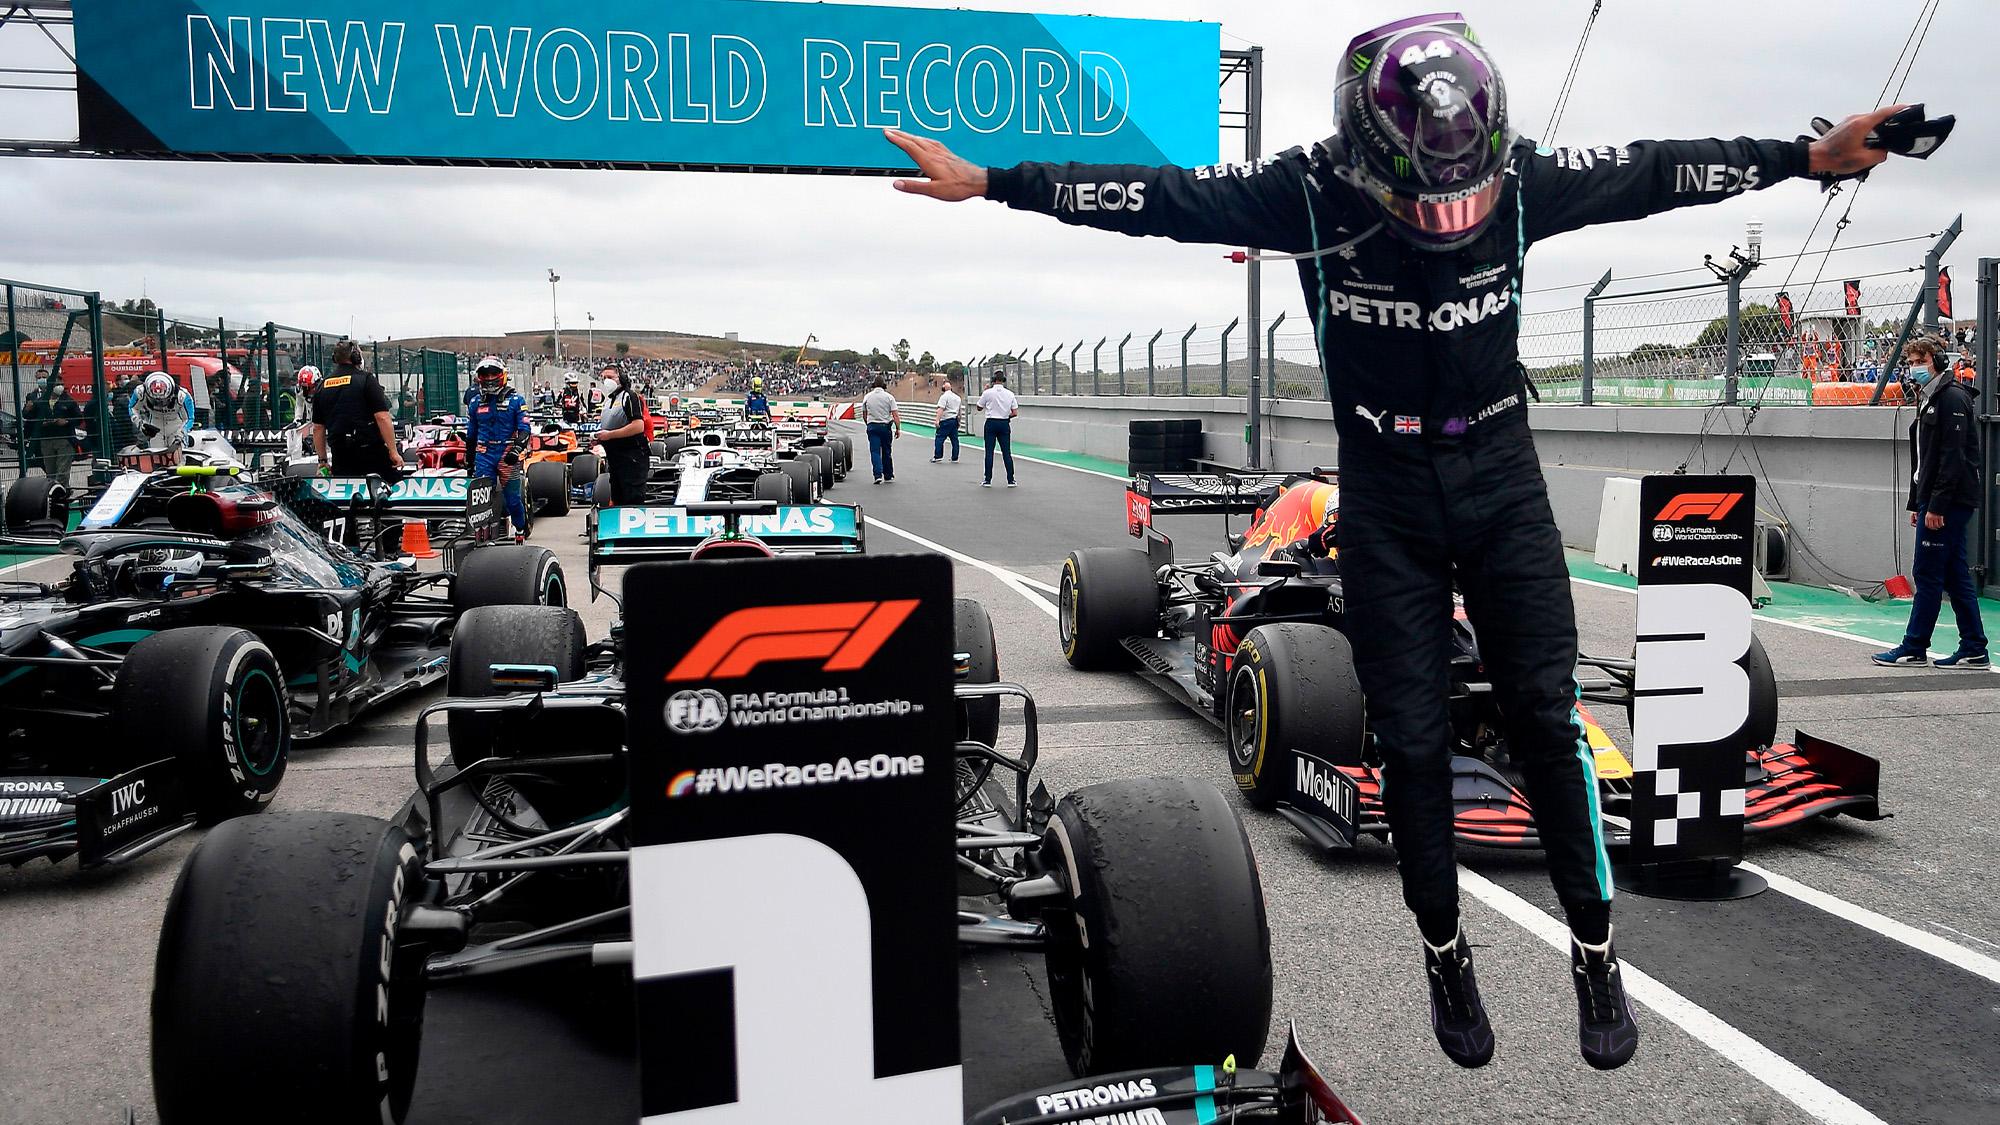 Formula 1 champion, Lewis Hamilton